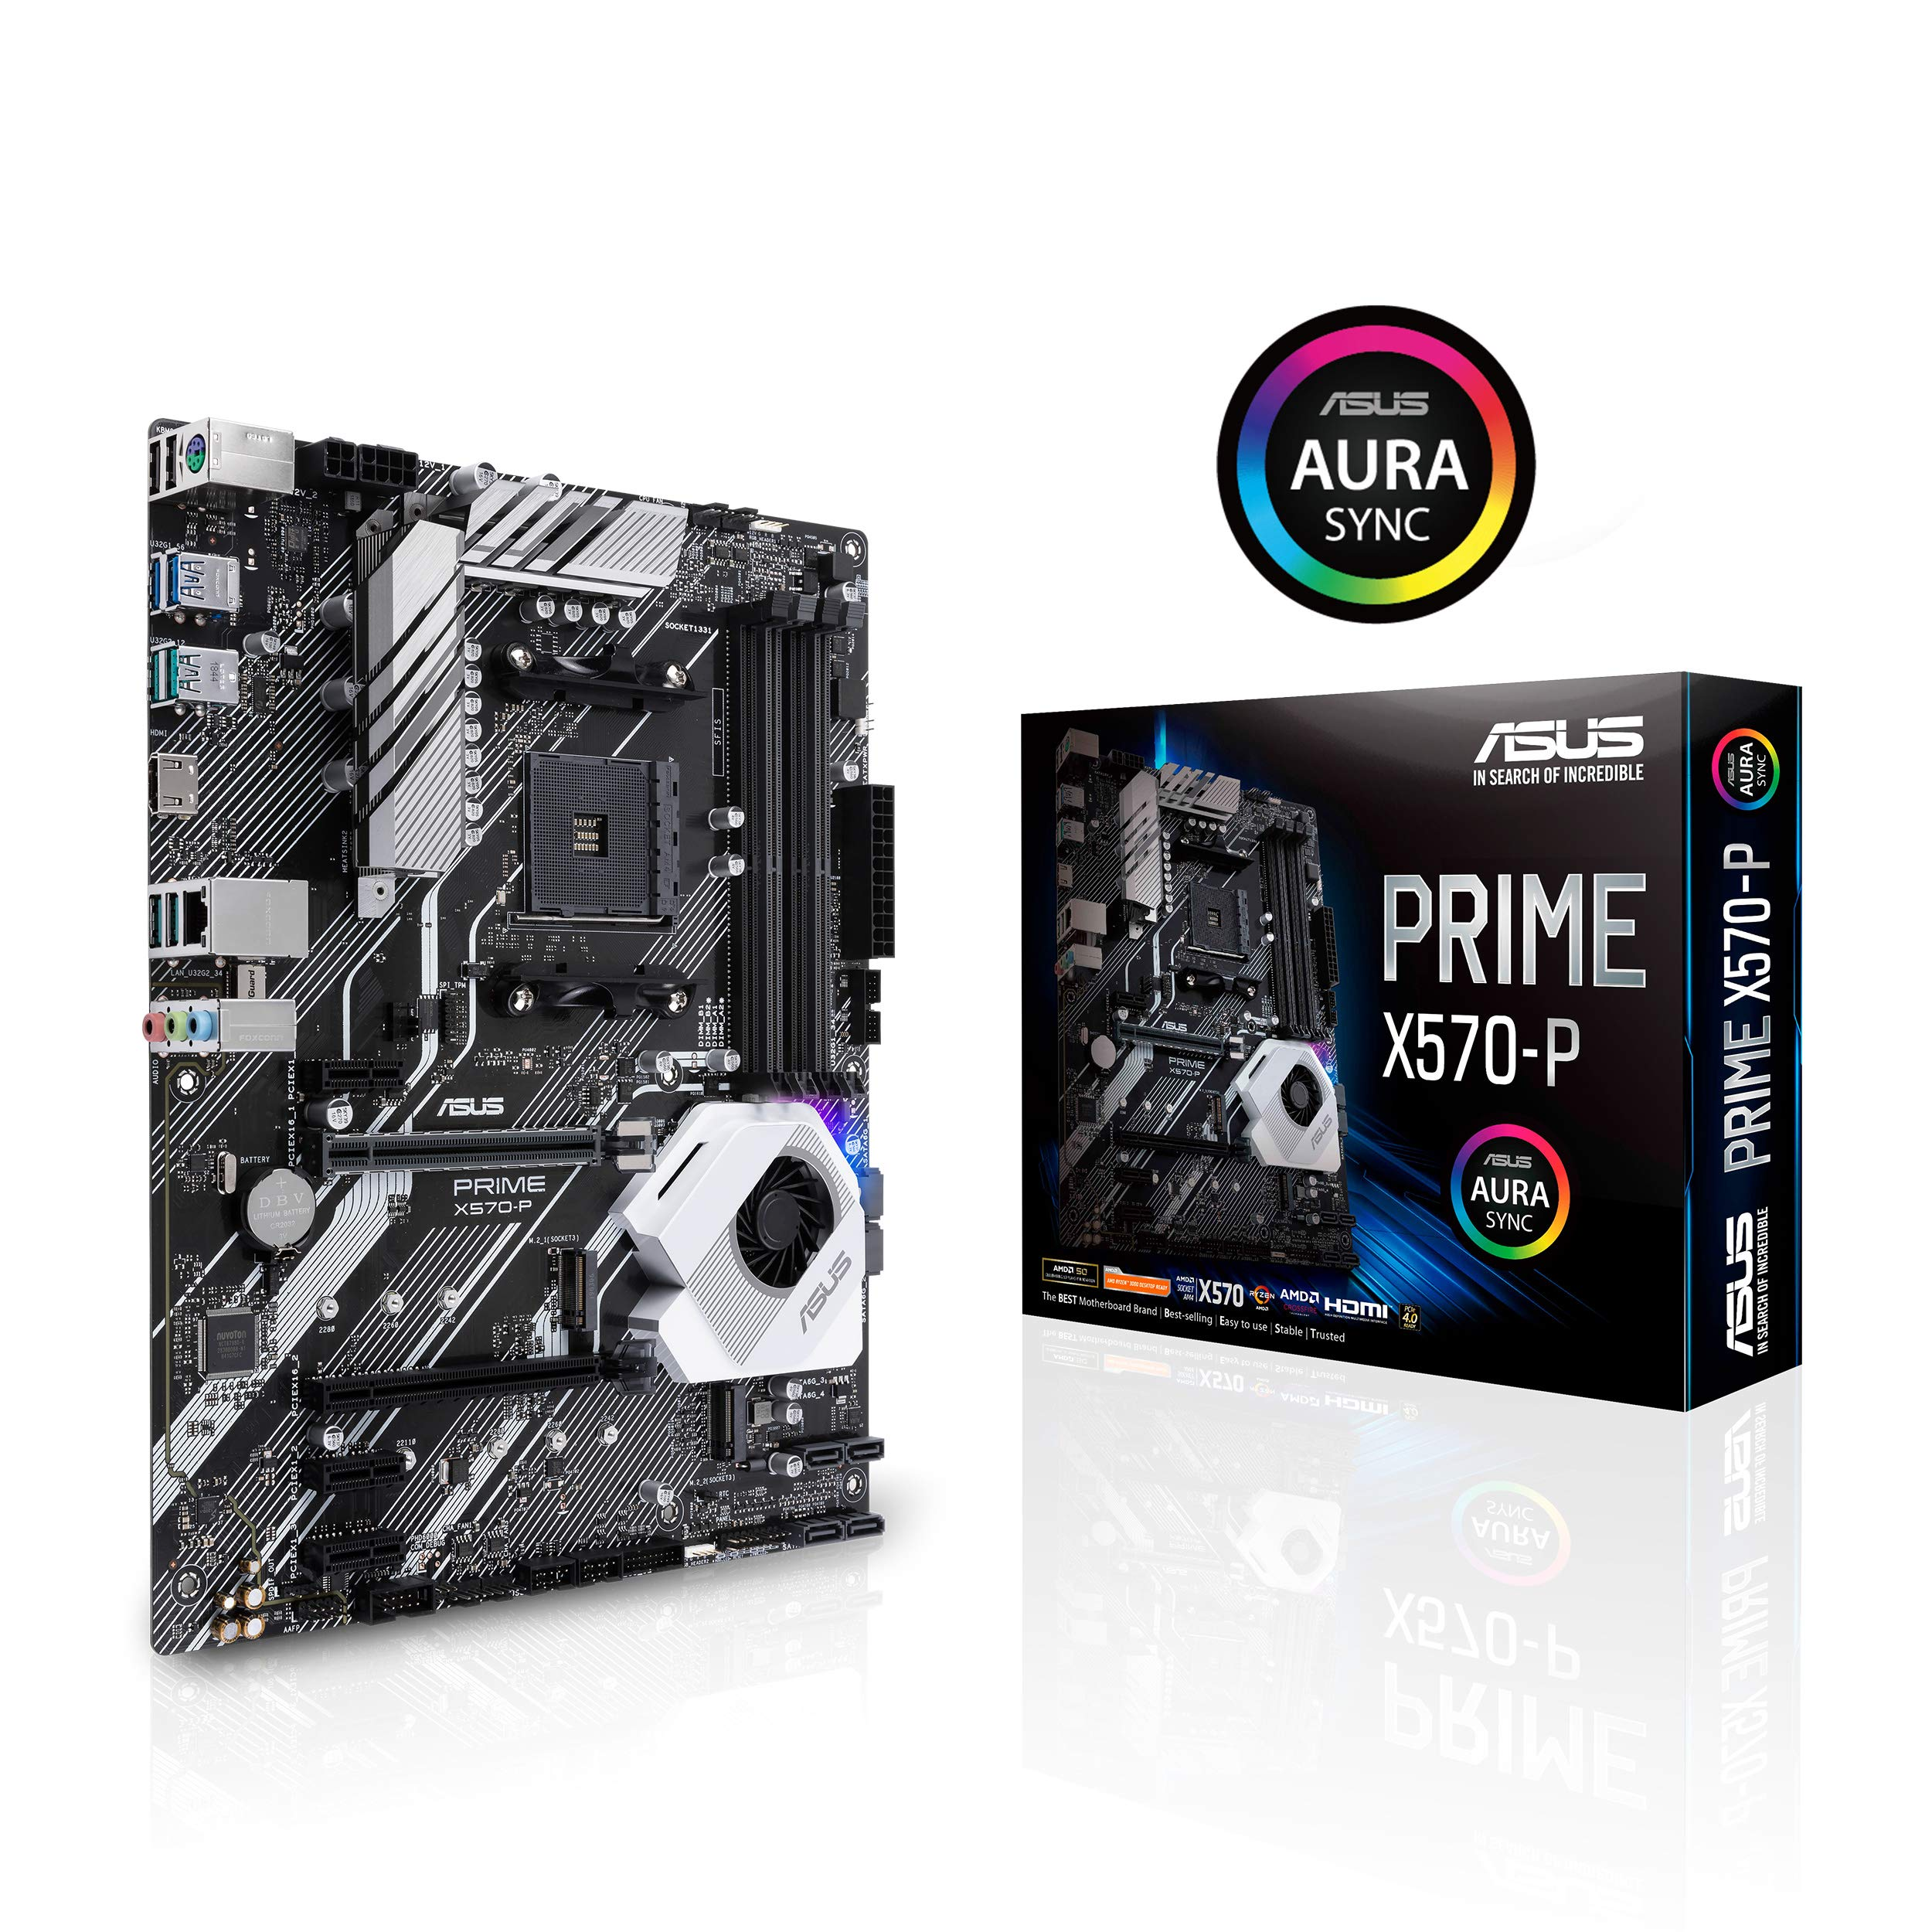 Asus Prime X570-P Ryzen 3 AM4 with PCIe Gen4, Dual M.2 HDMI, SATA 6GB/s USB 3.2 Gen 2 ATX Motherboard by ASUS